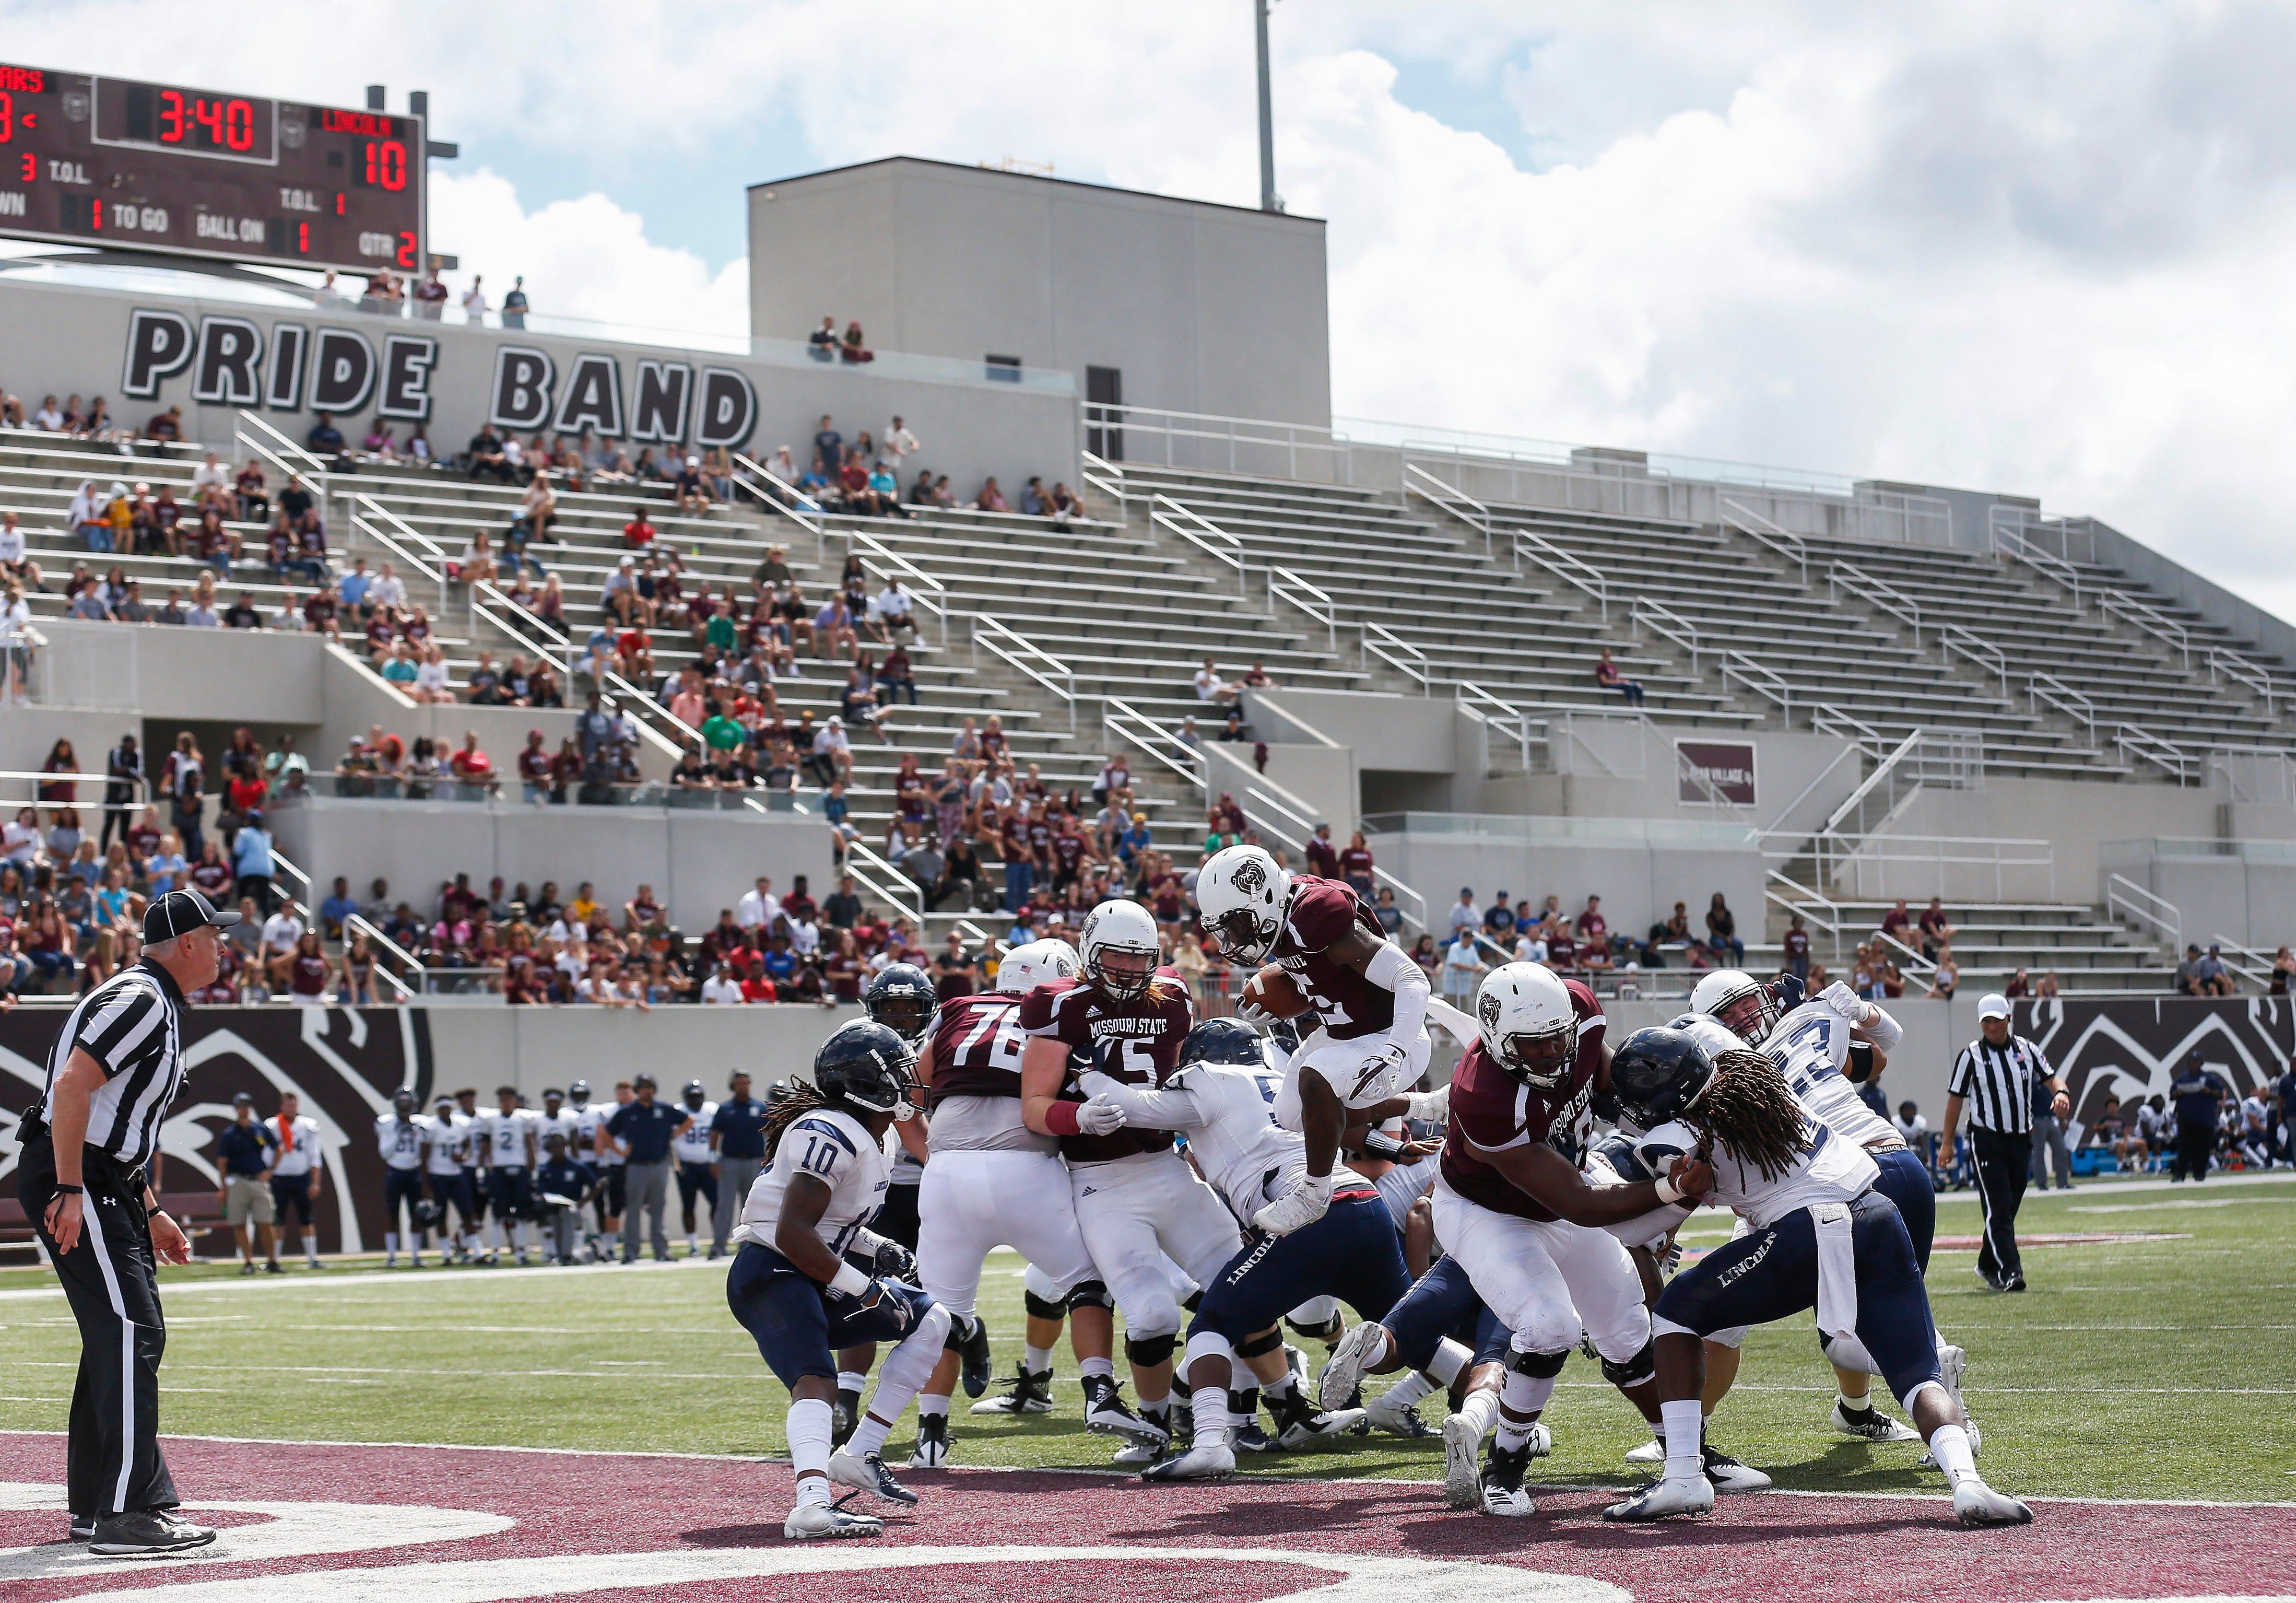 Jason Randall, of Missouri State University, leaps into the endzone during the Bears' home opener at Plaster Stadium against Lincoln University on Thursday, Sep. 6, 2018.